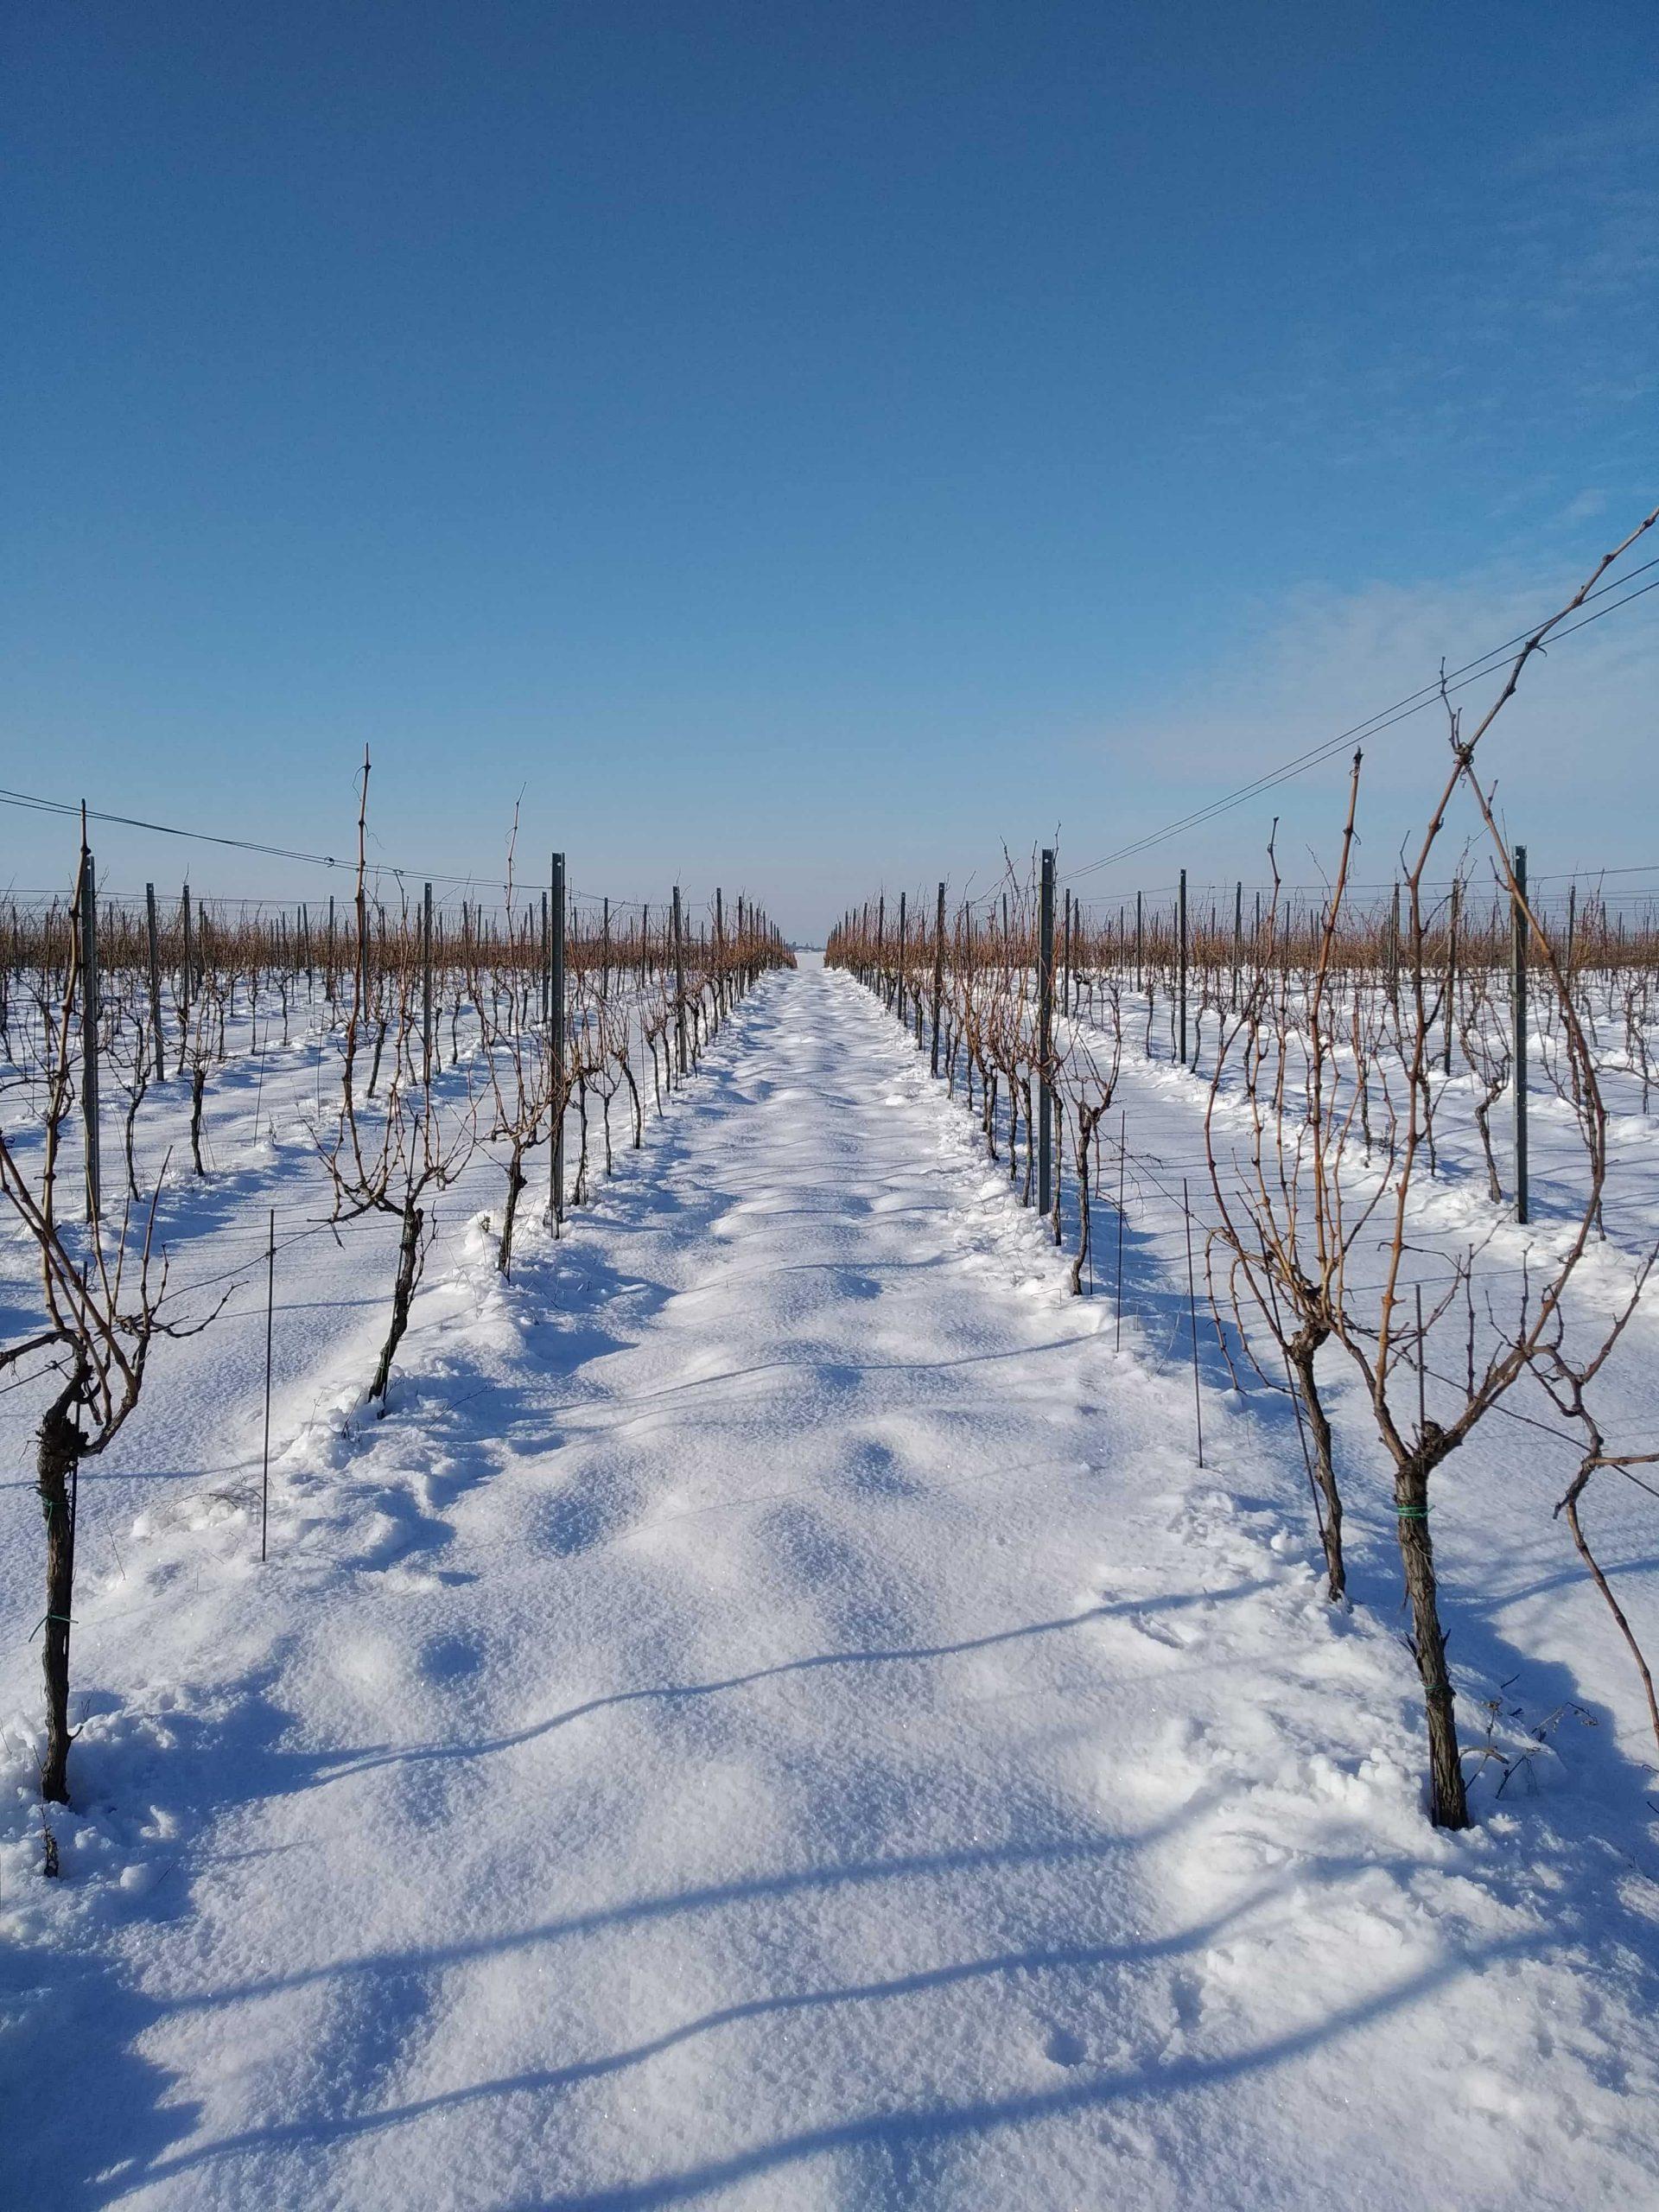 vinohrad7_Vinarstvo Kopecek-min